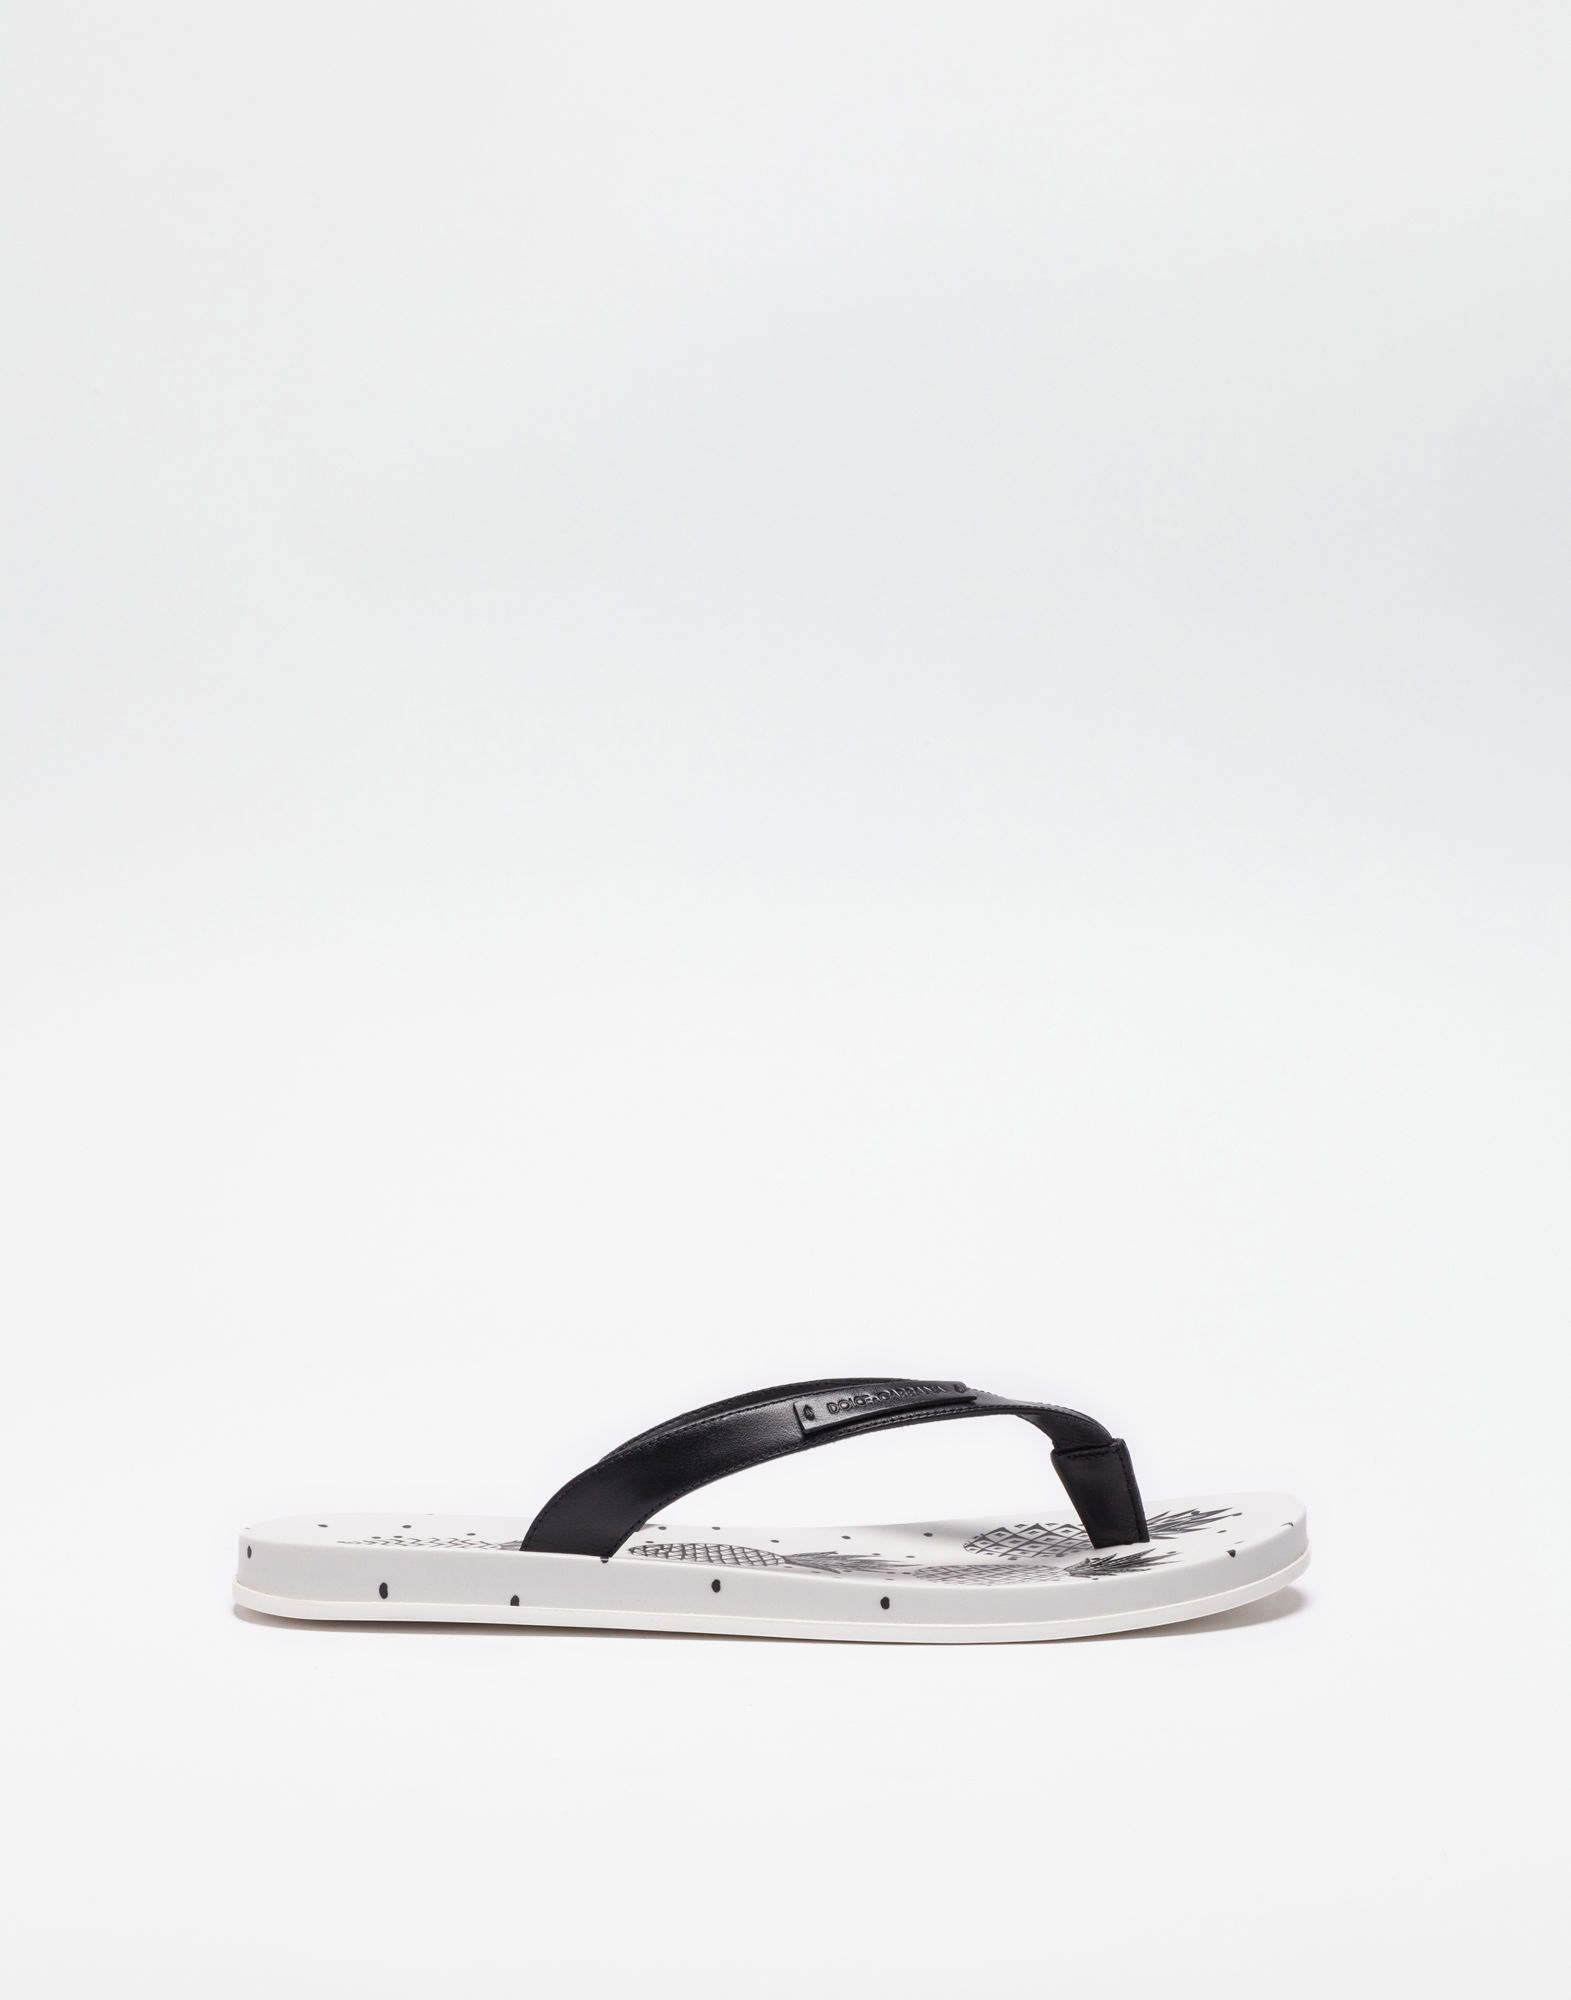 a2d215e901f99c DOLCE   GABBANA Printed Rubber Toe-Thong Sandals.  dolcegabbana  shoes